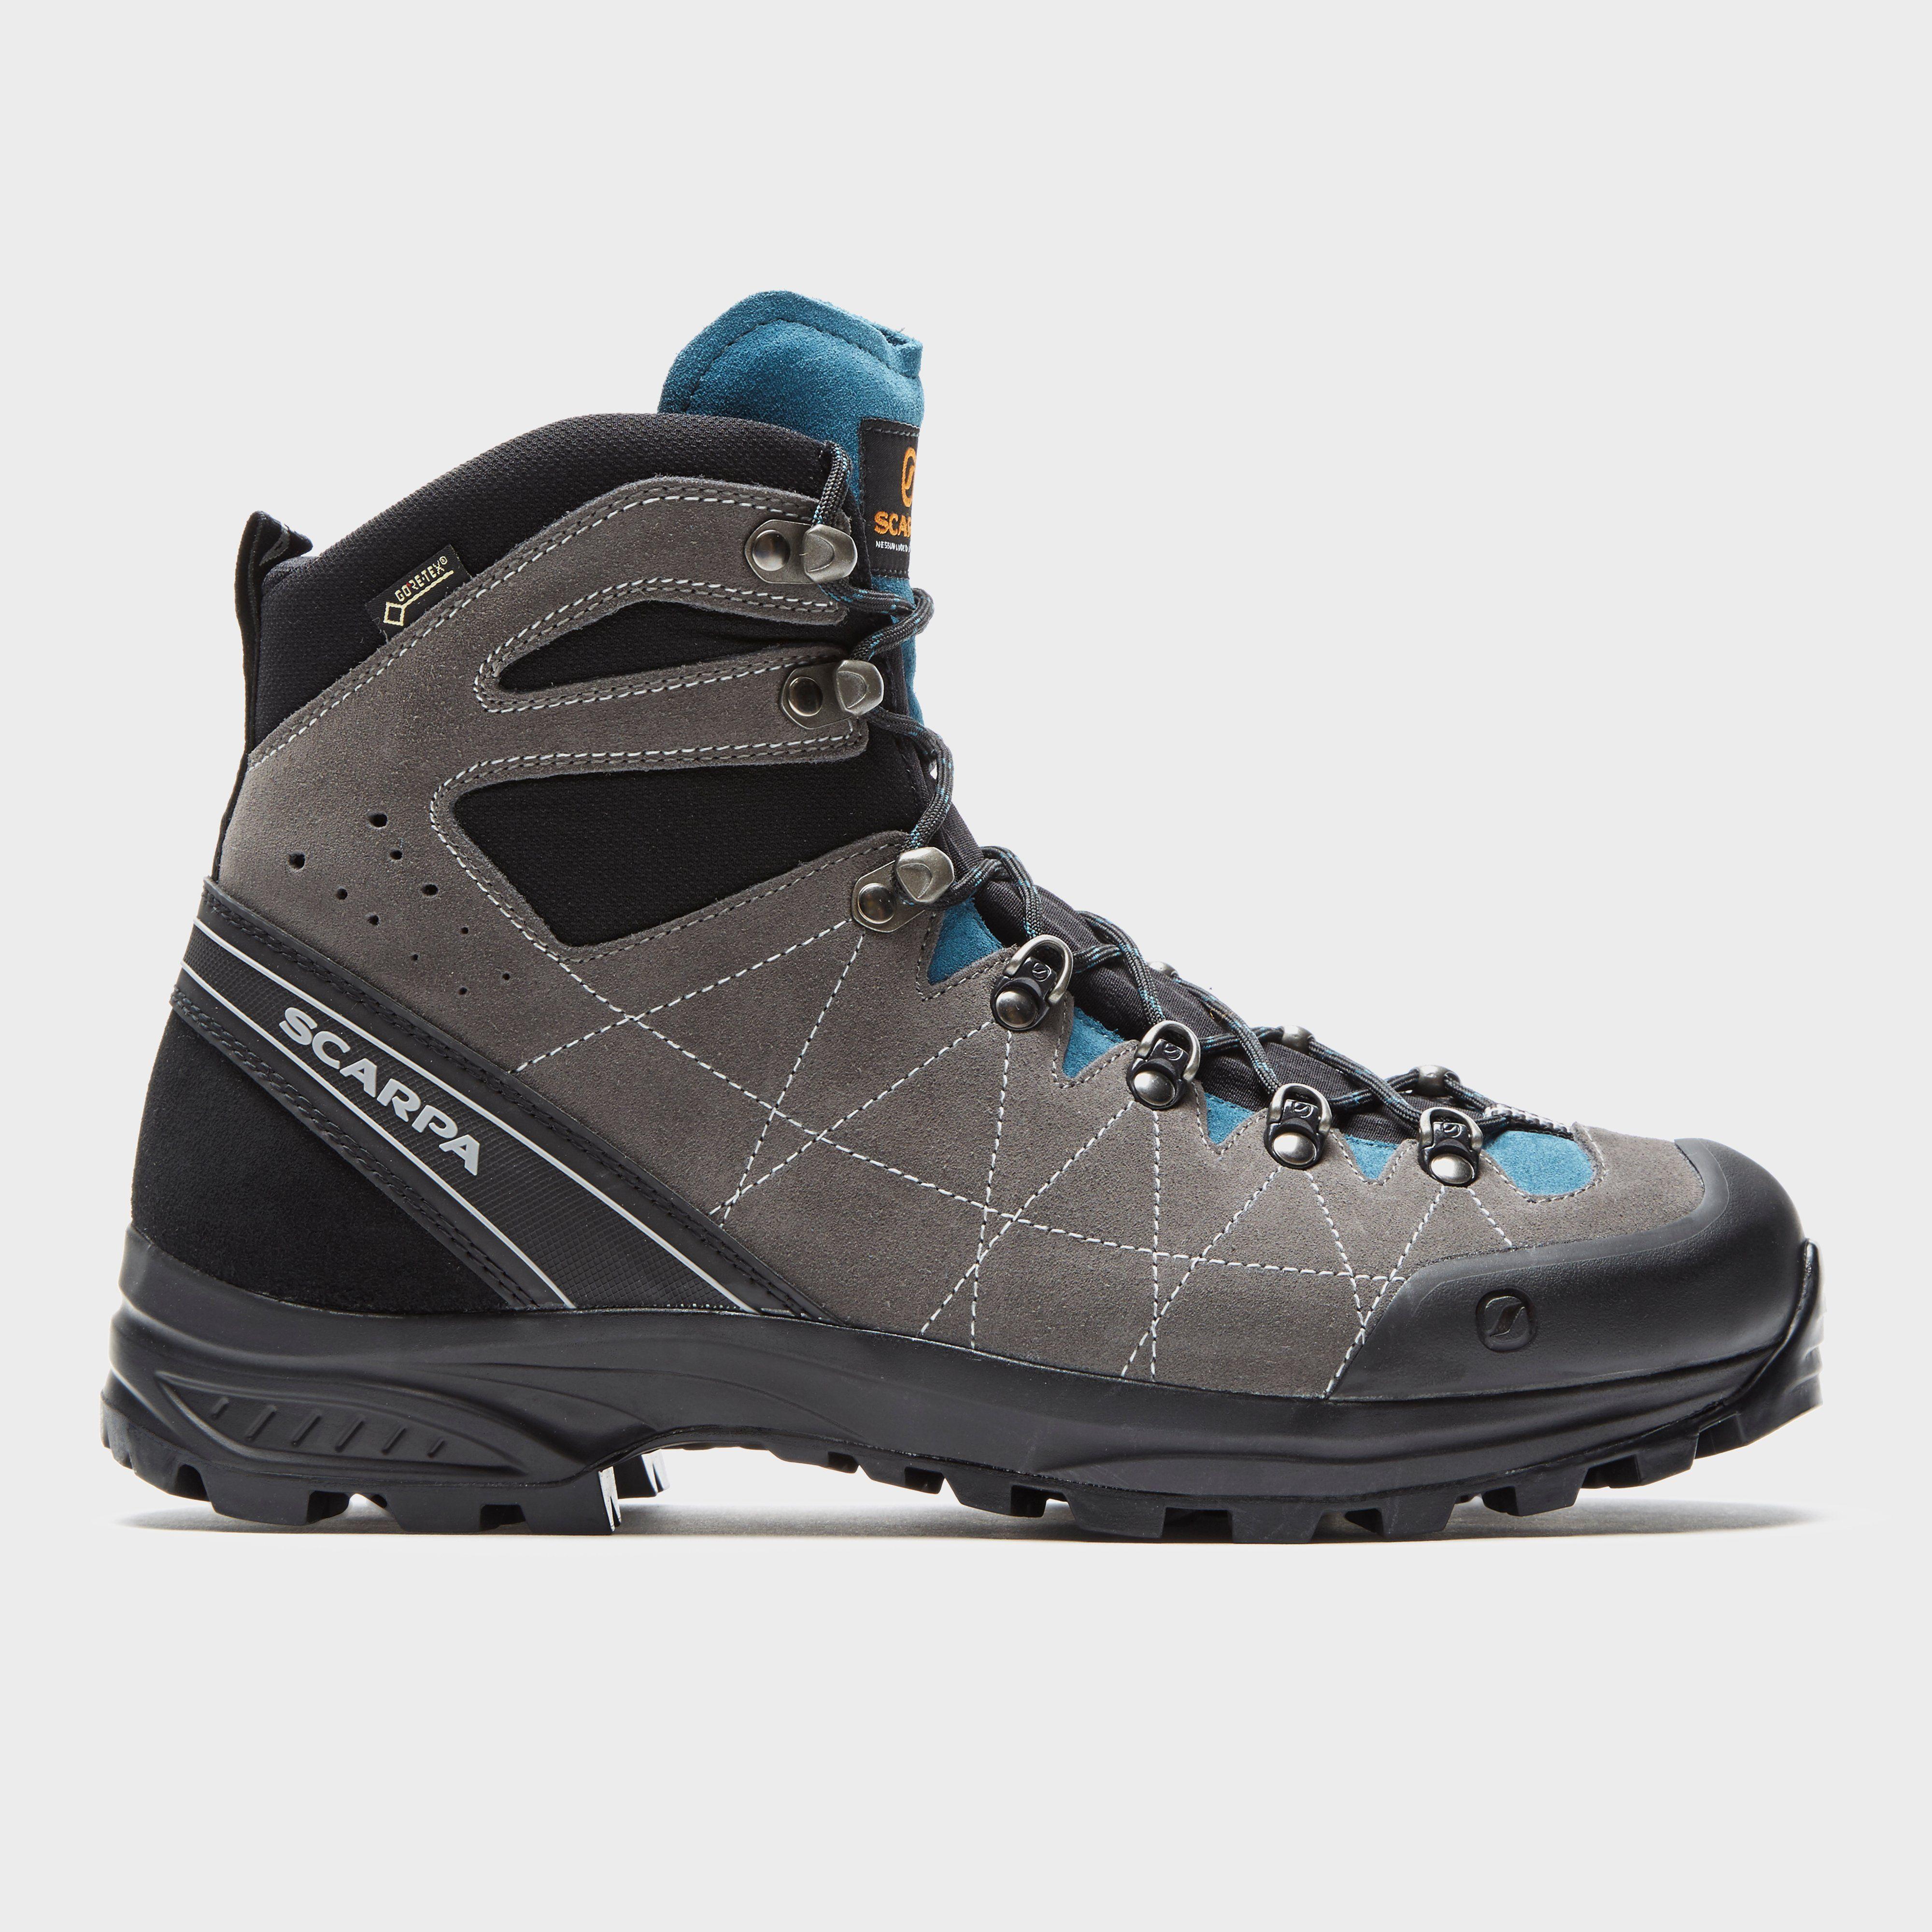 SCARPA Men's R-Evo GORE-TEX® Hiking Boot